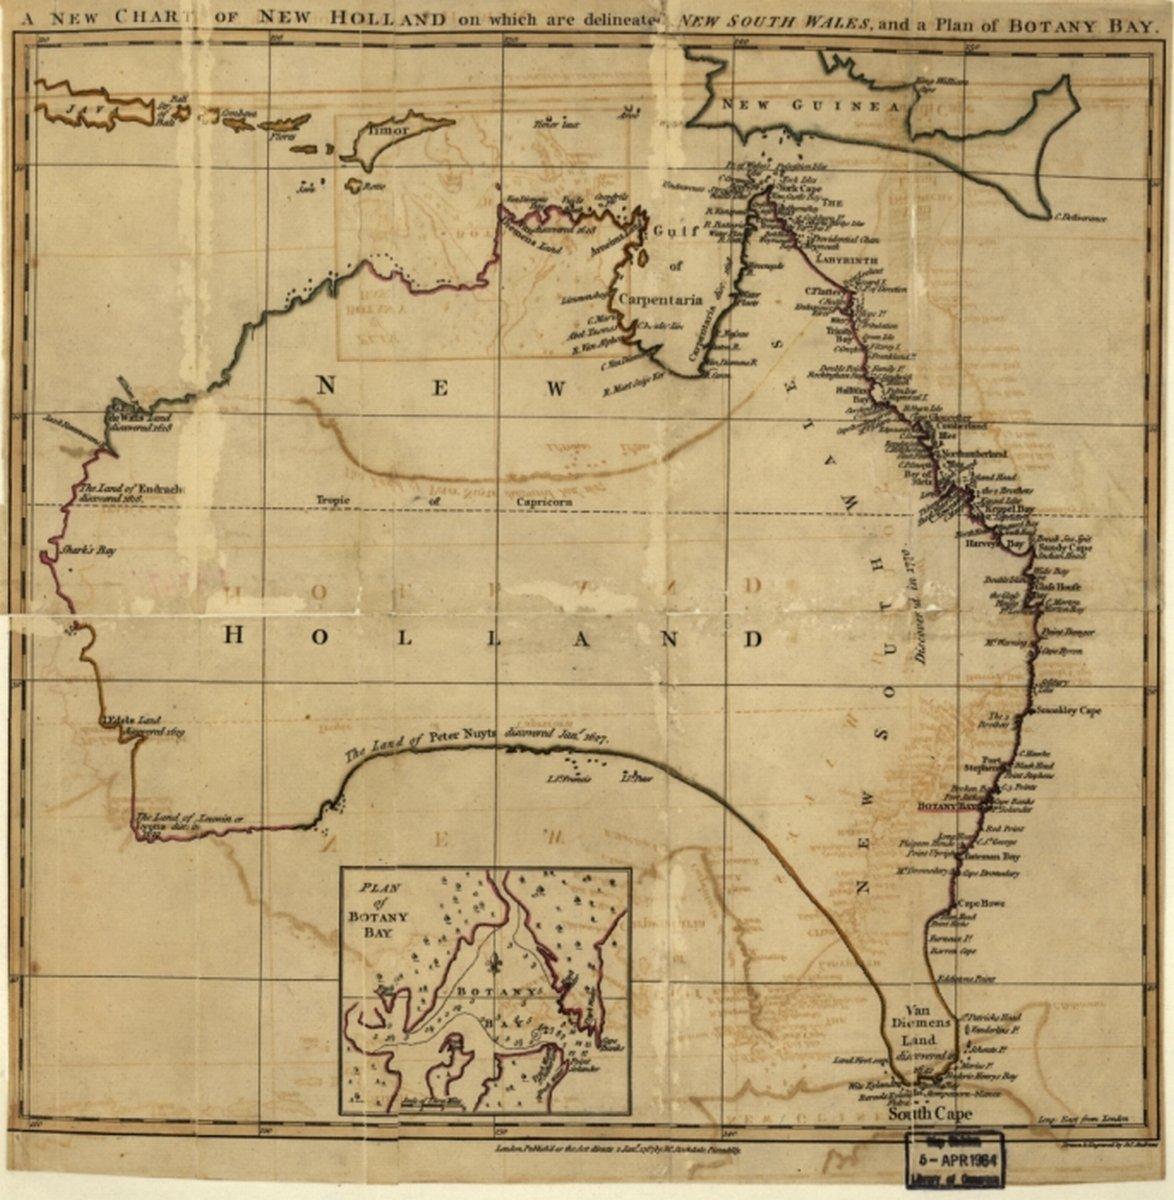 Map Of Australia 1700.Amazon Com 1700 Map Australia Australia New Holland On Which Are